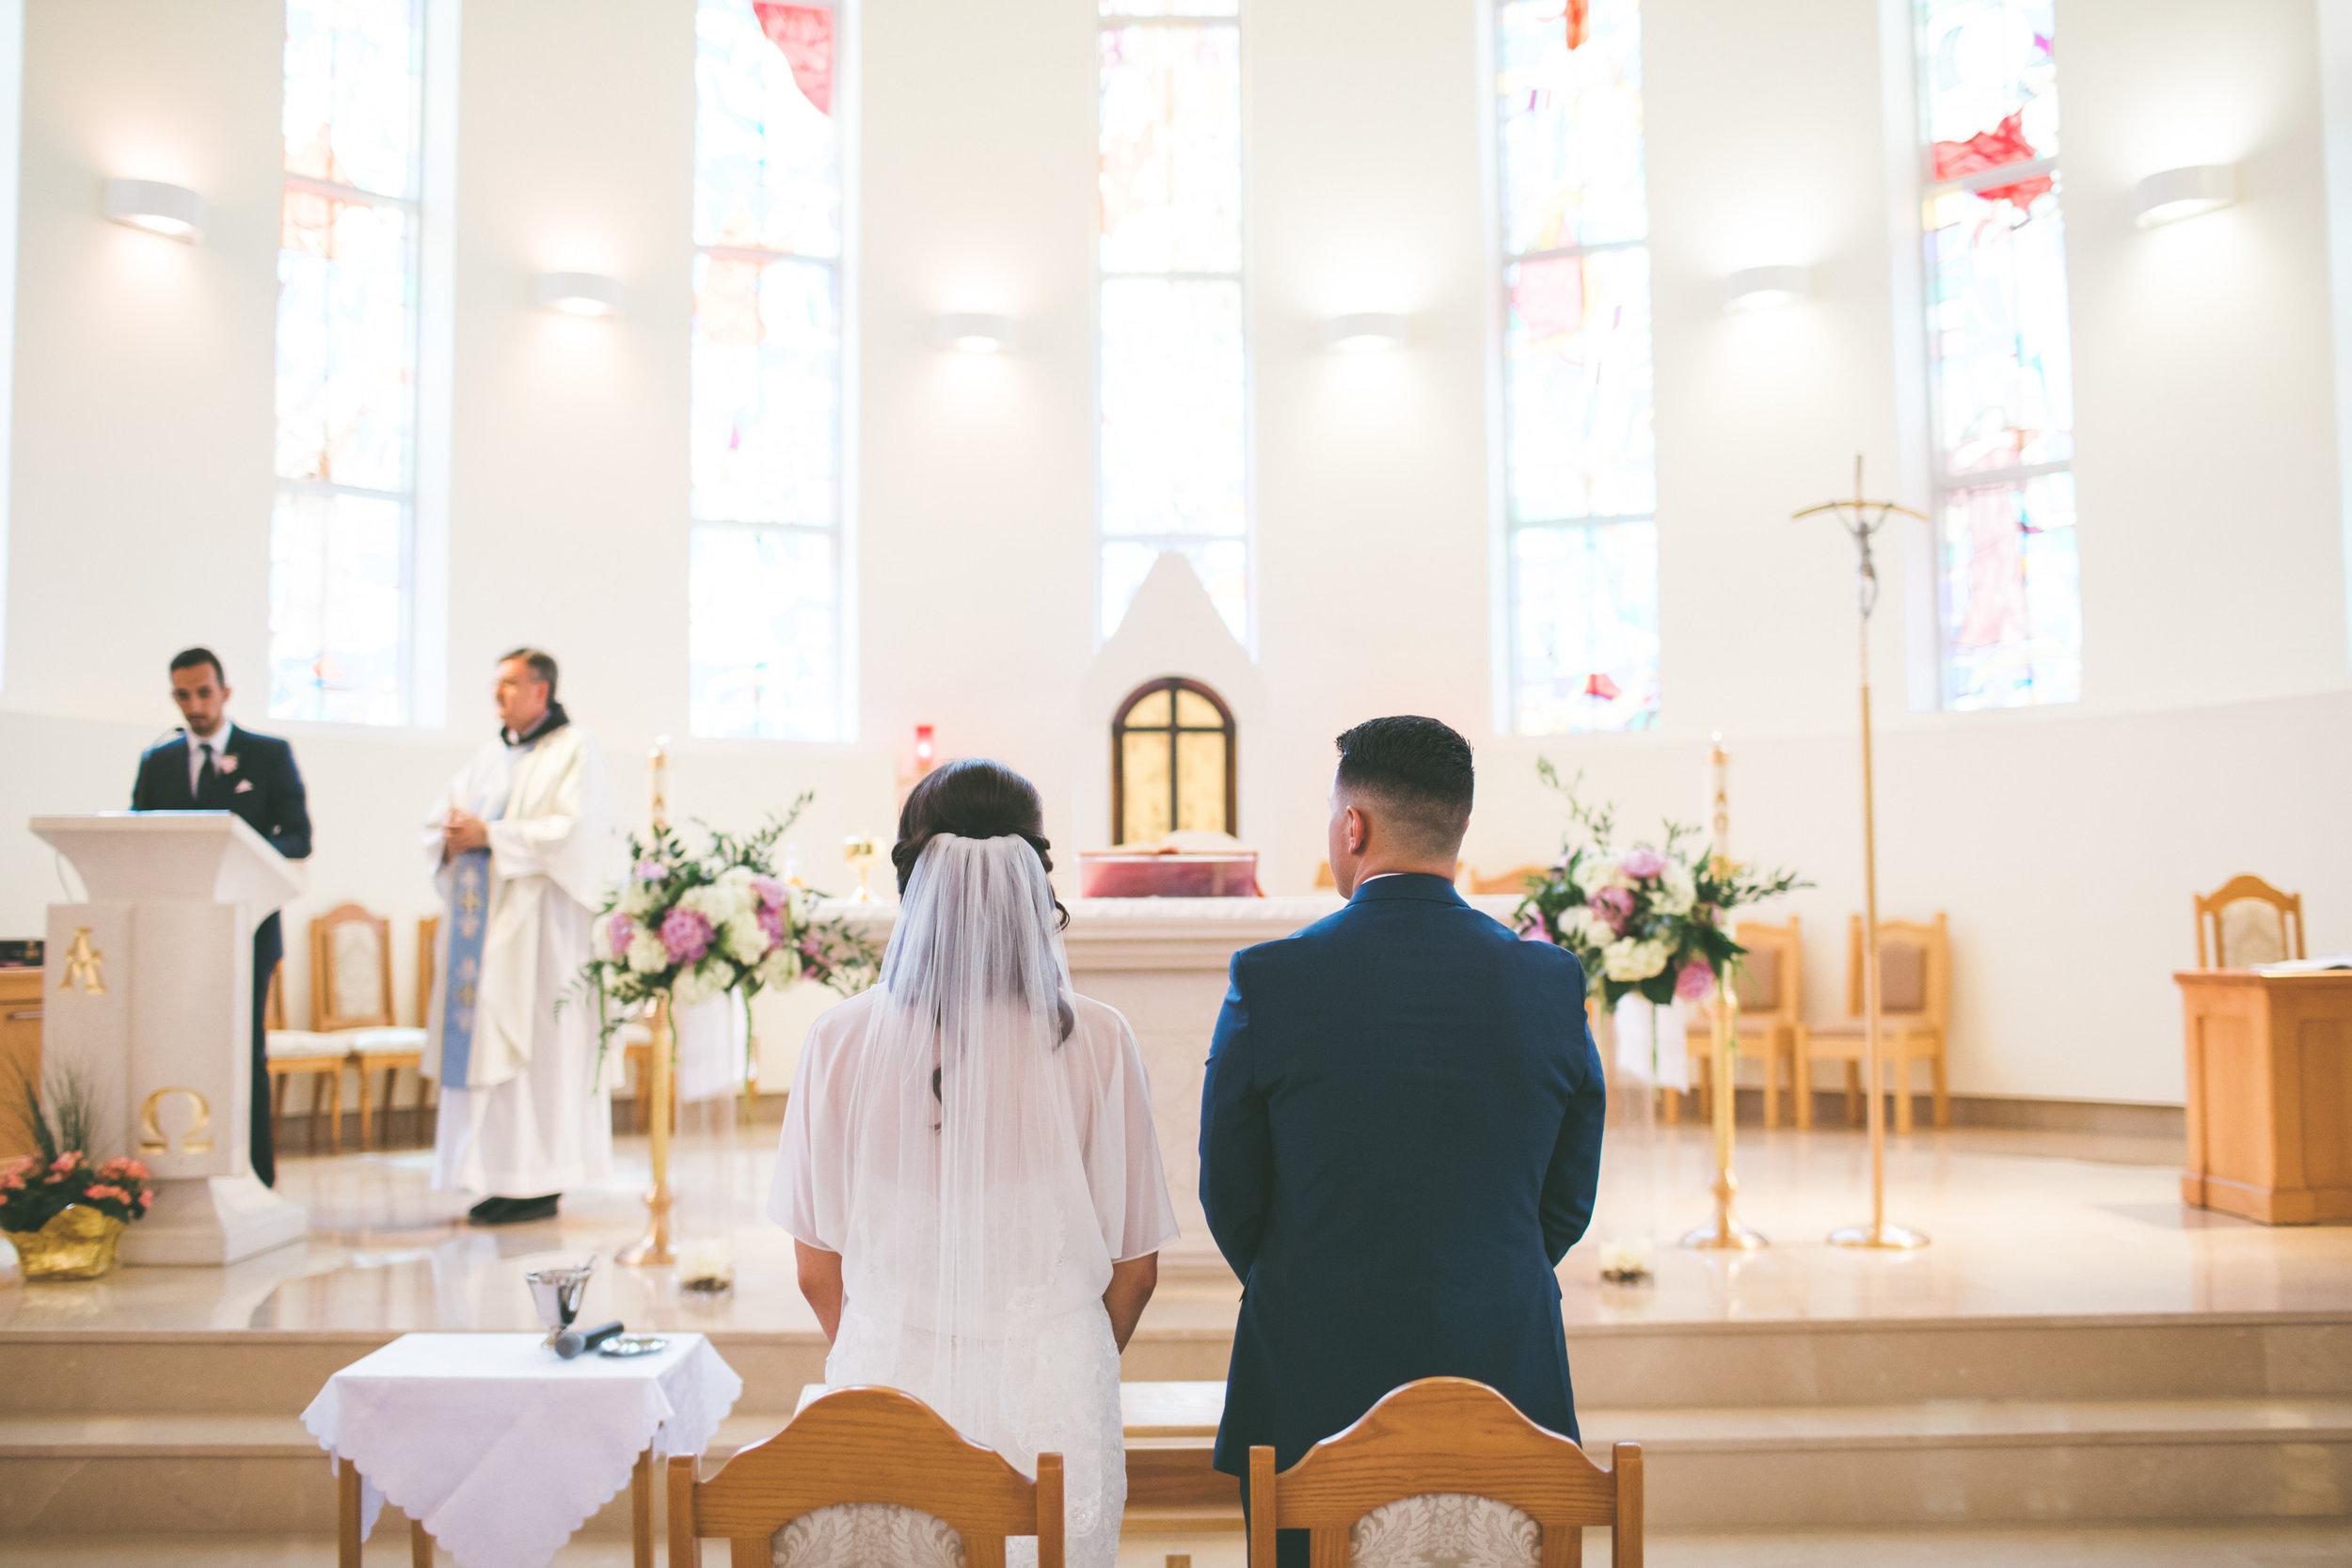 ashley___dario_wedding___lifesreel_danielcaruso___0817.jpg